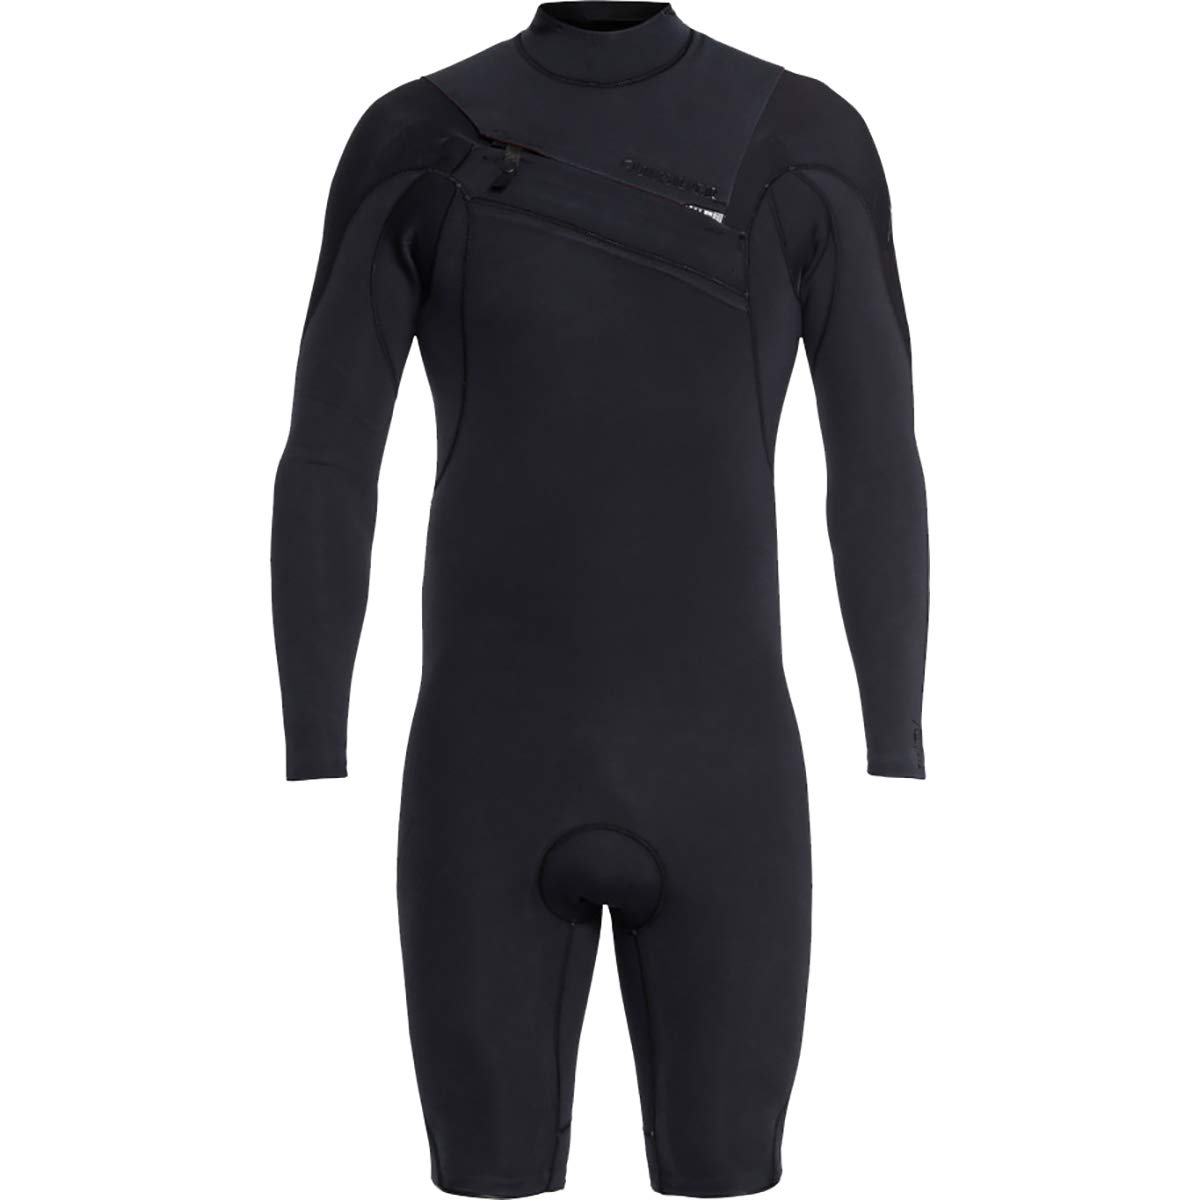 Quiksilver Highline Limited 2/2mm Men's Full Wetsuits - Black/Medium